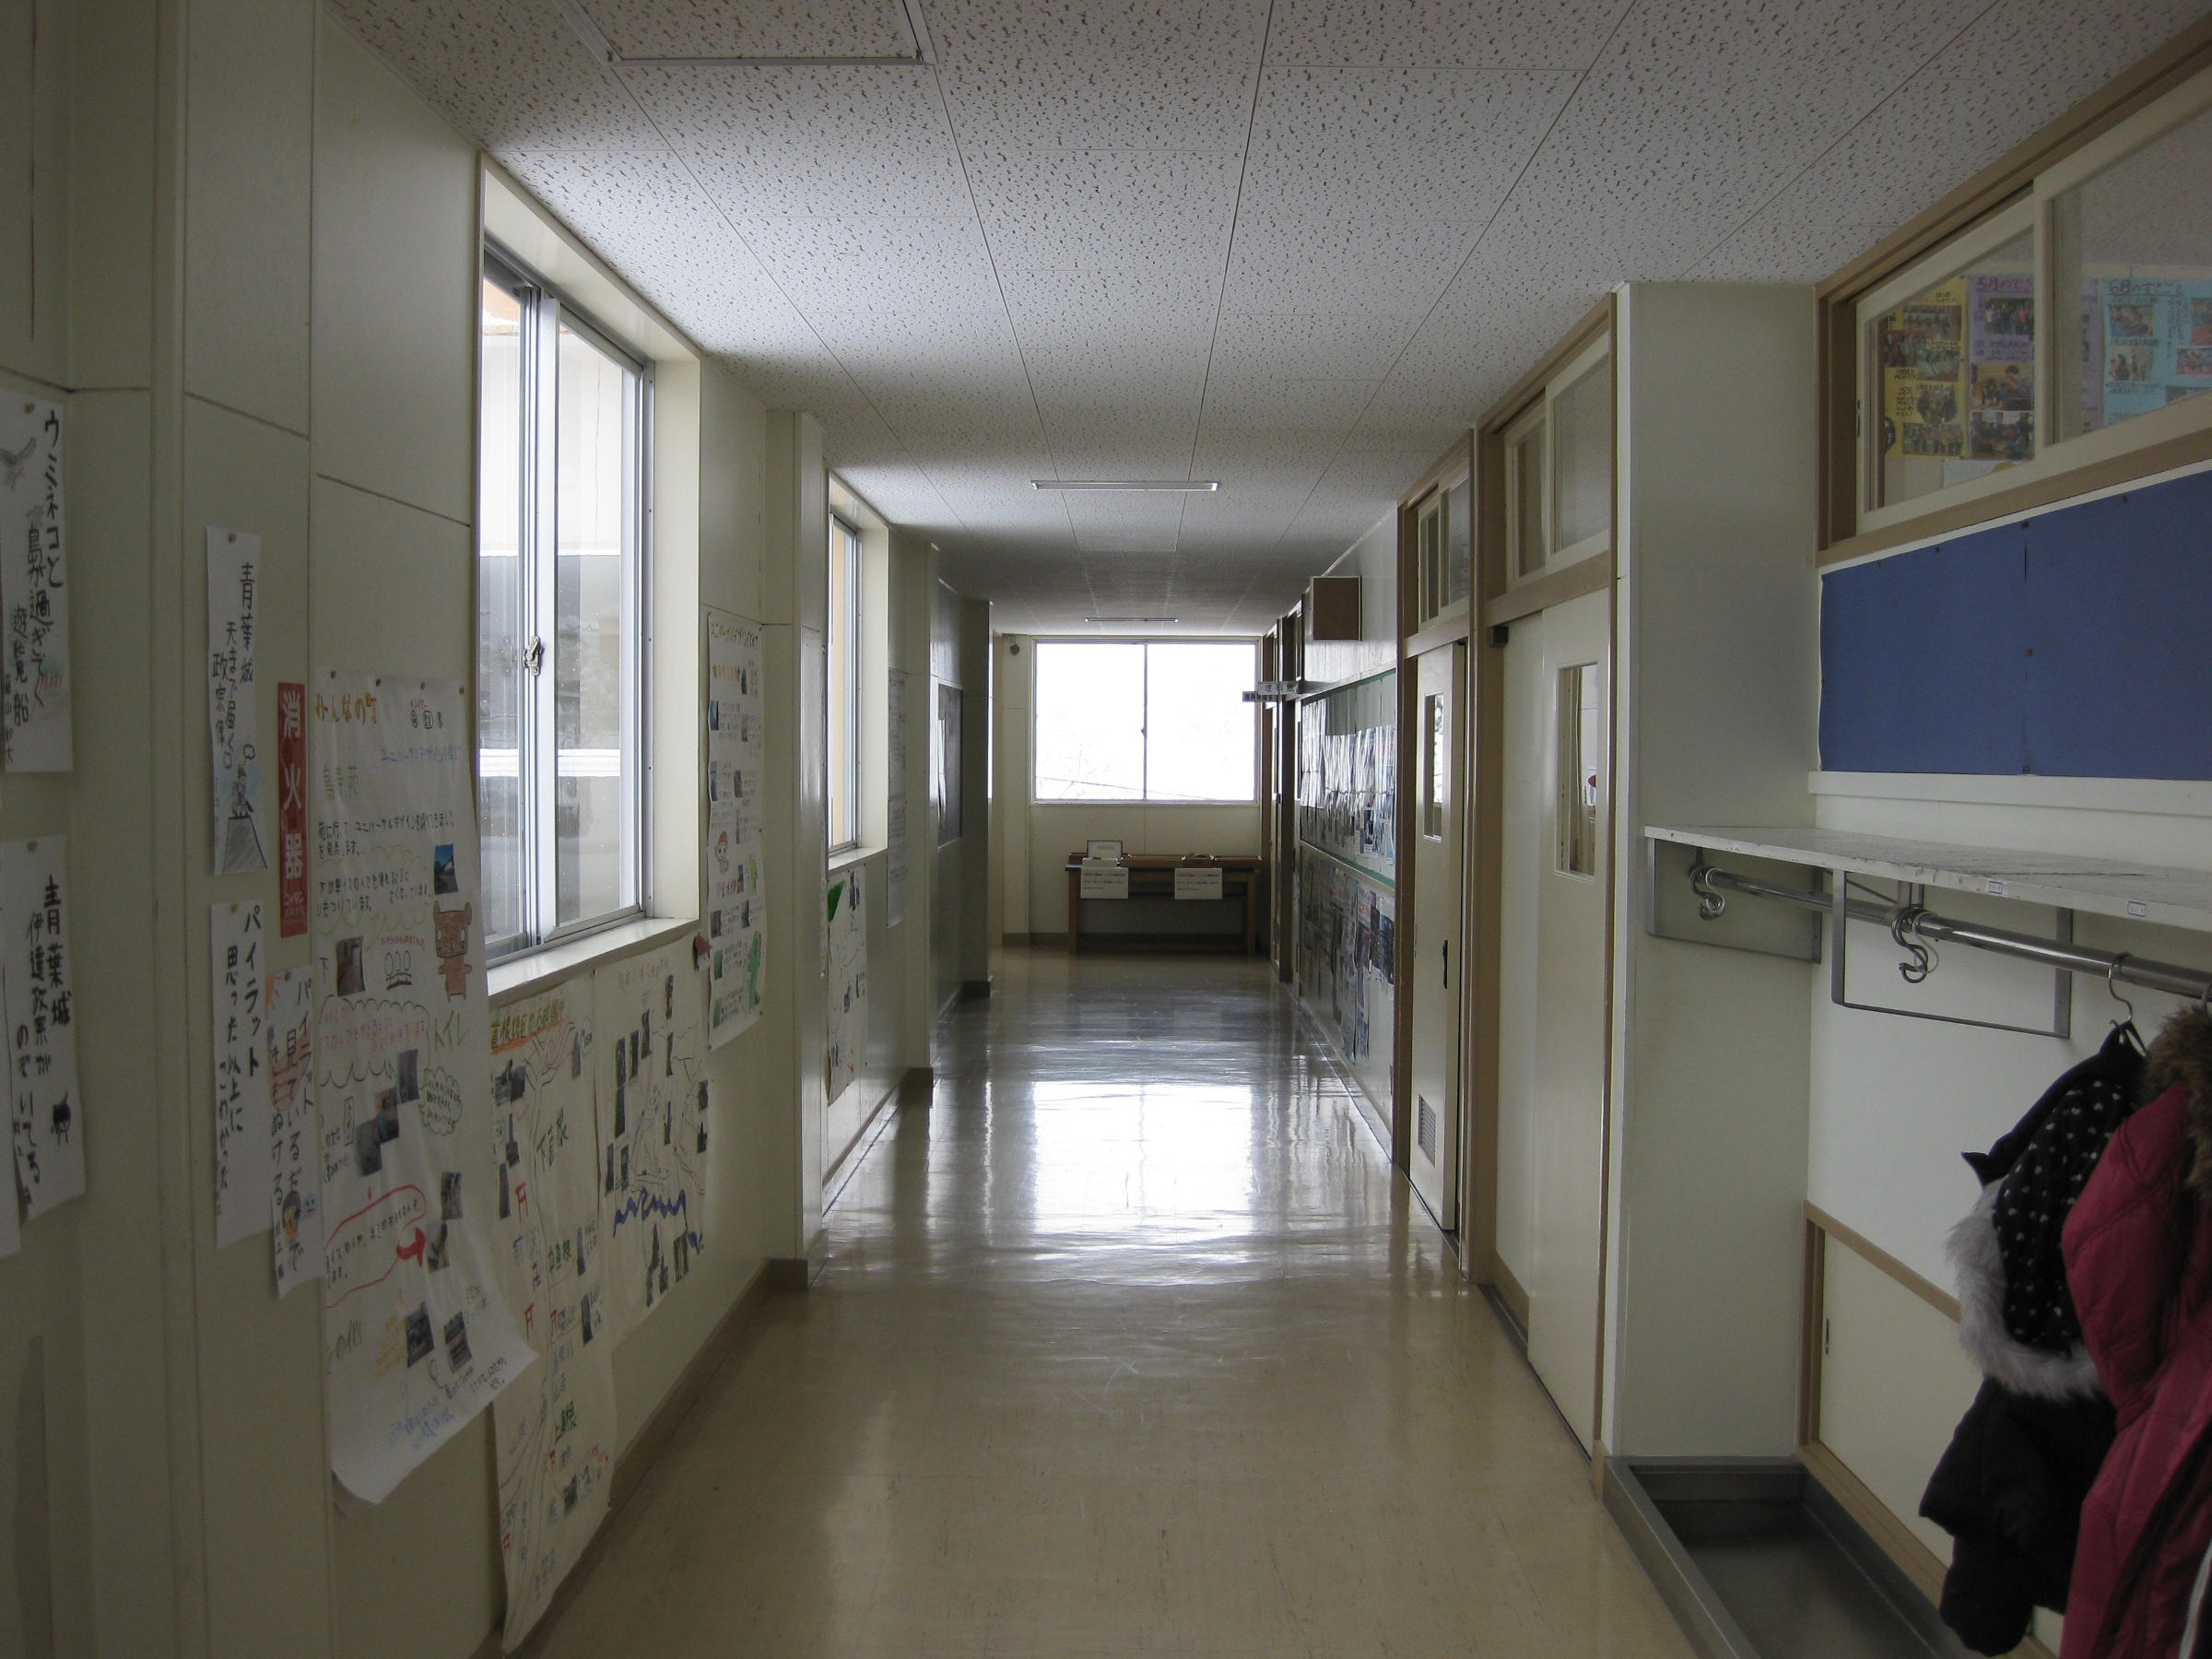 File:Hitane Elementary School hallway 3.jpg - Wikimedia ...